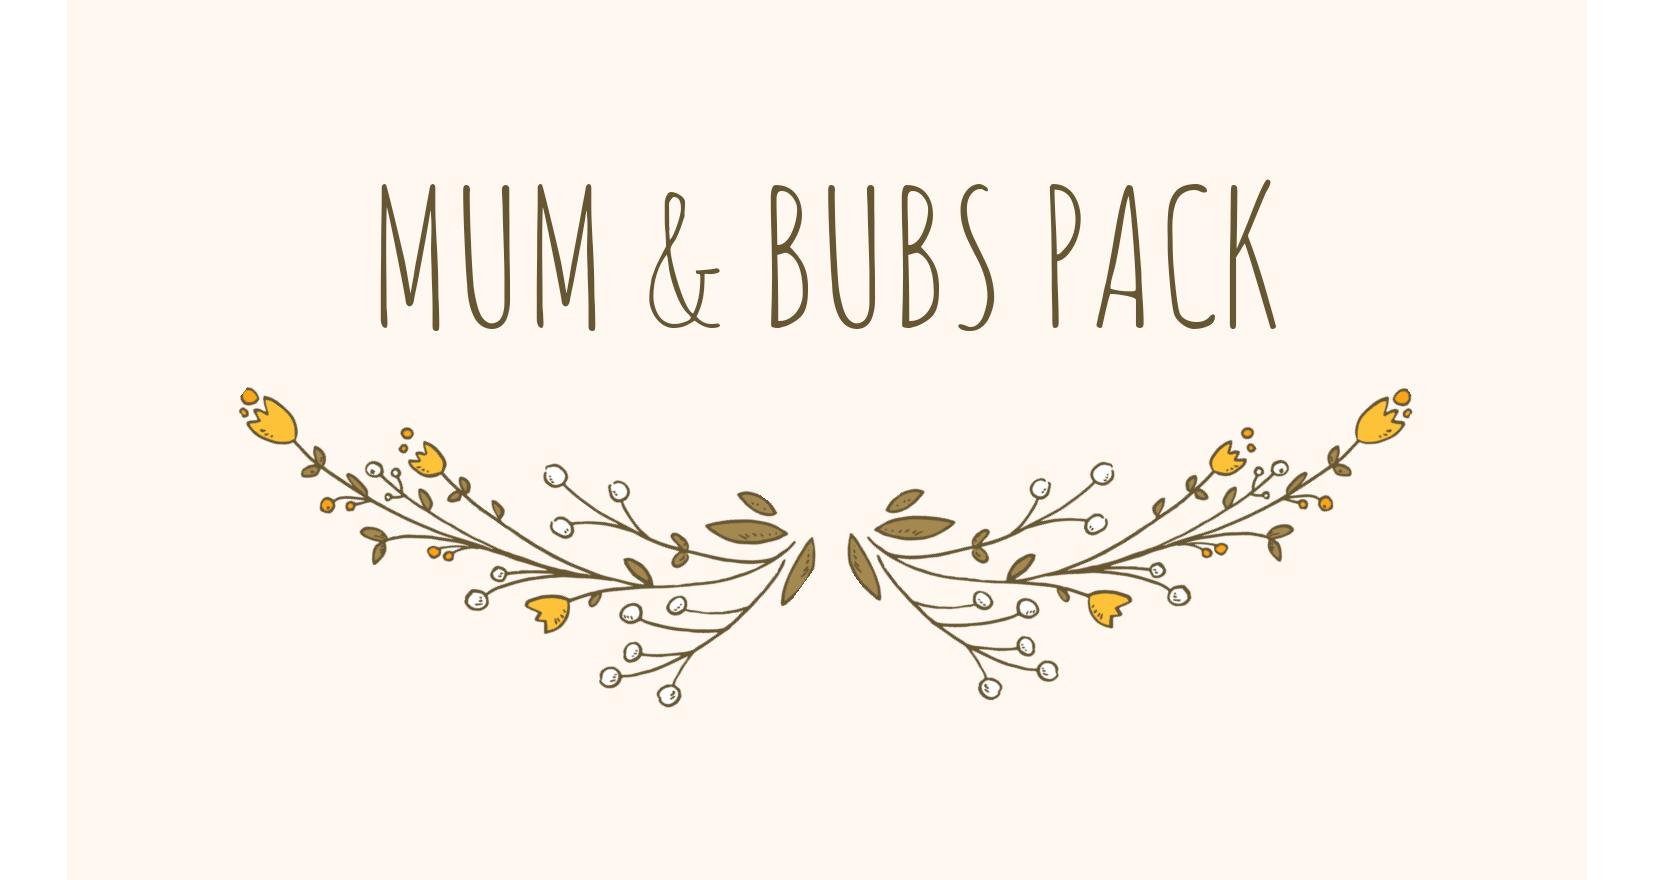 Mum & bubs pack